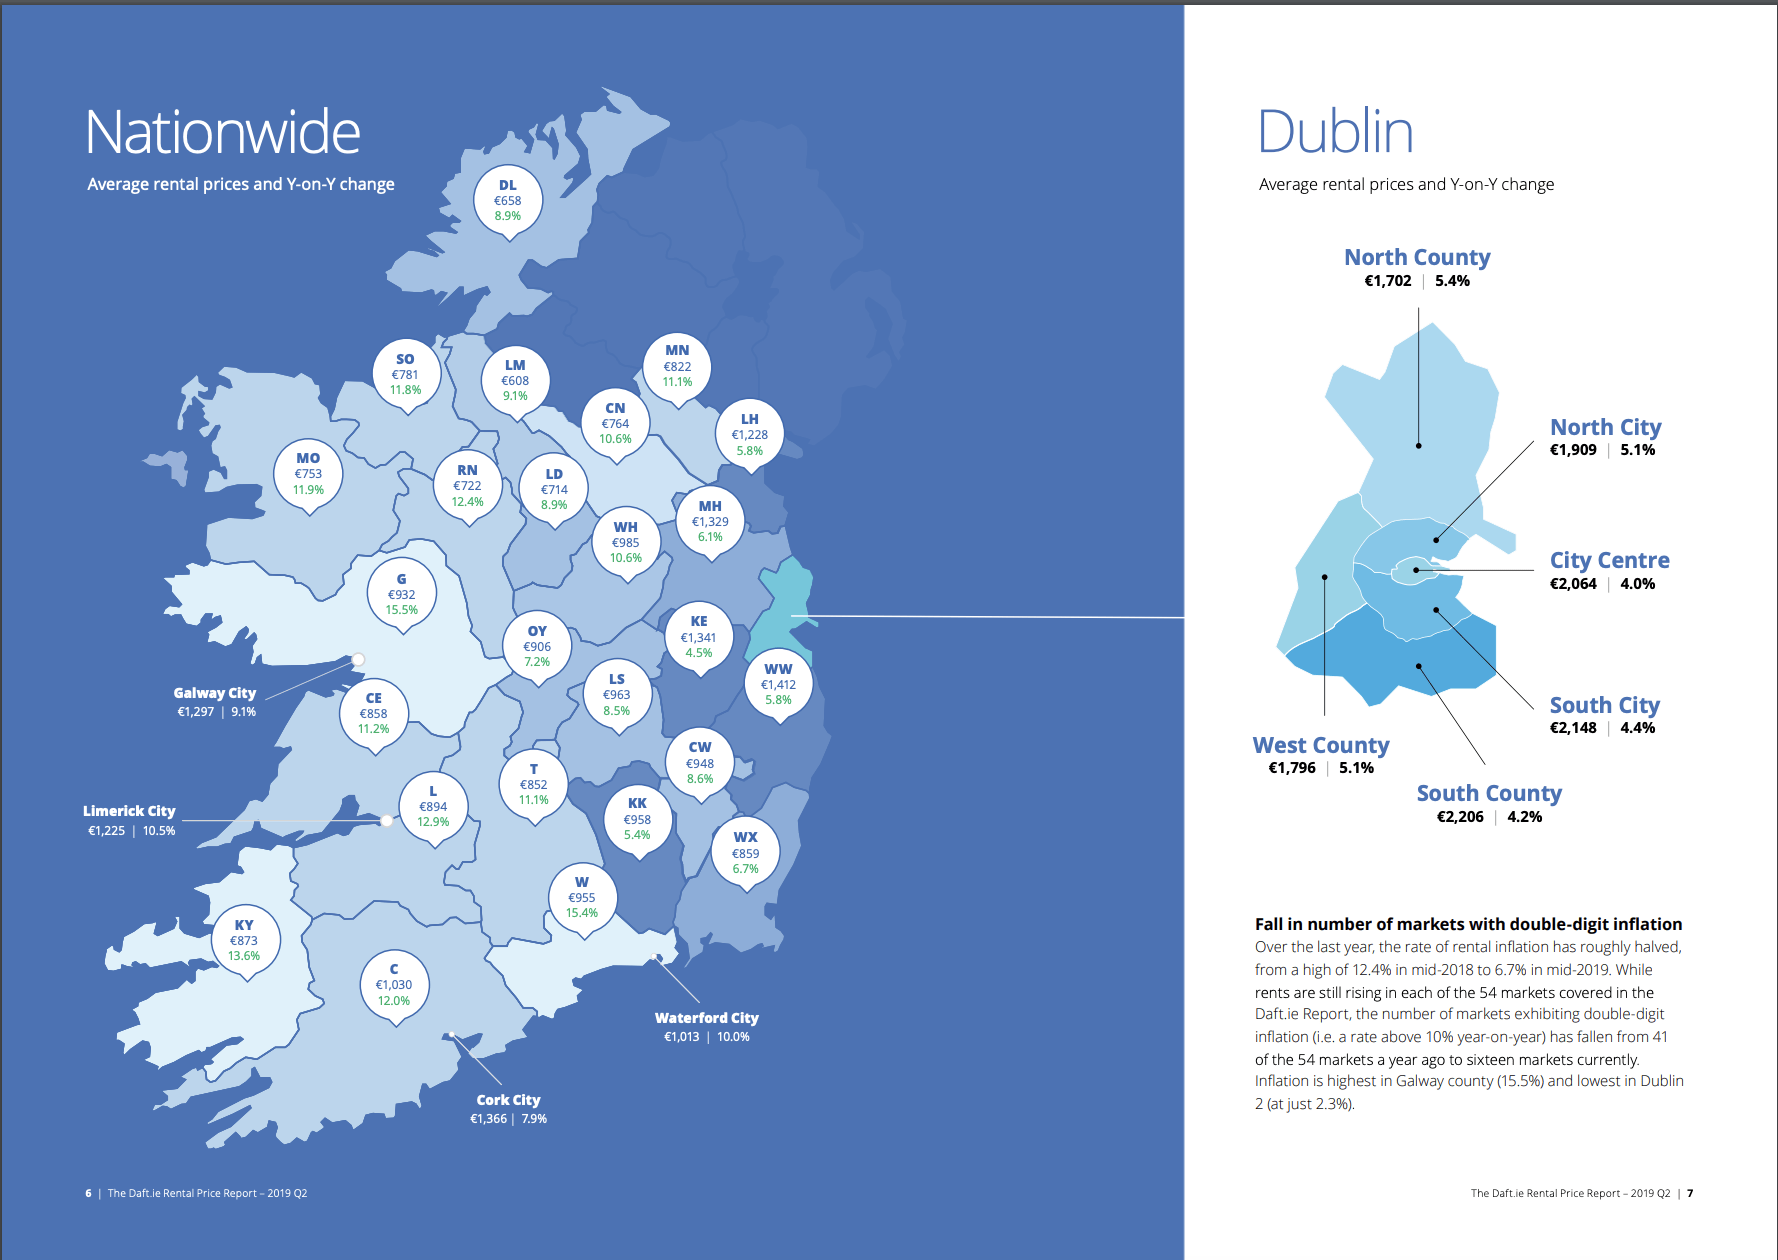 daft Ireland